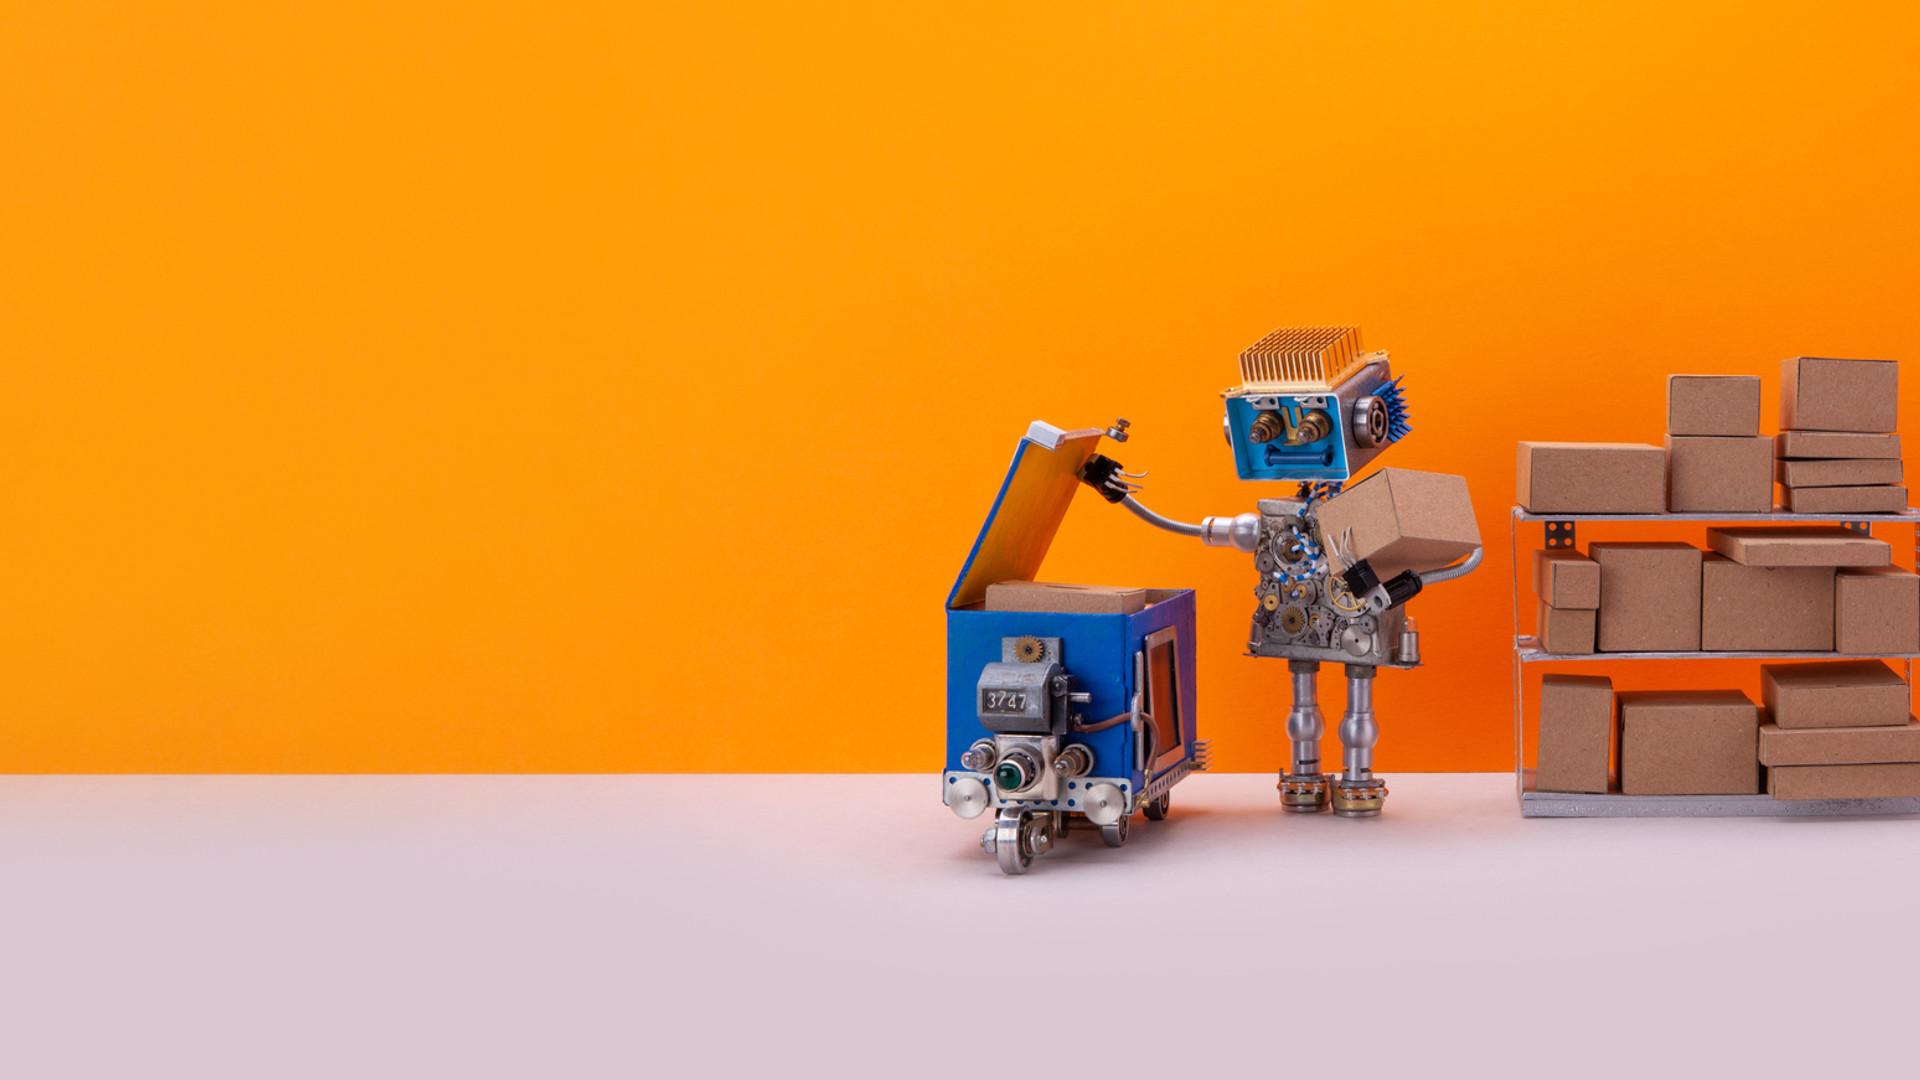 robot-storekeeper-uploads-parcels-into-a